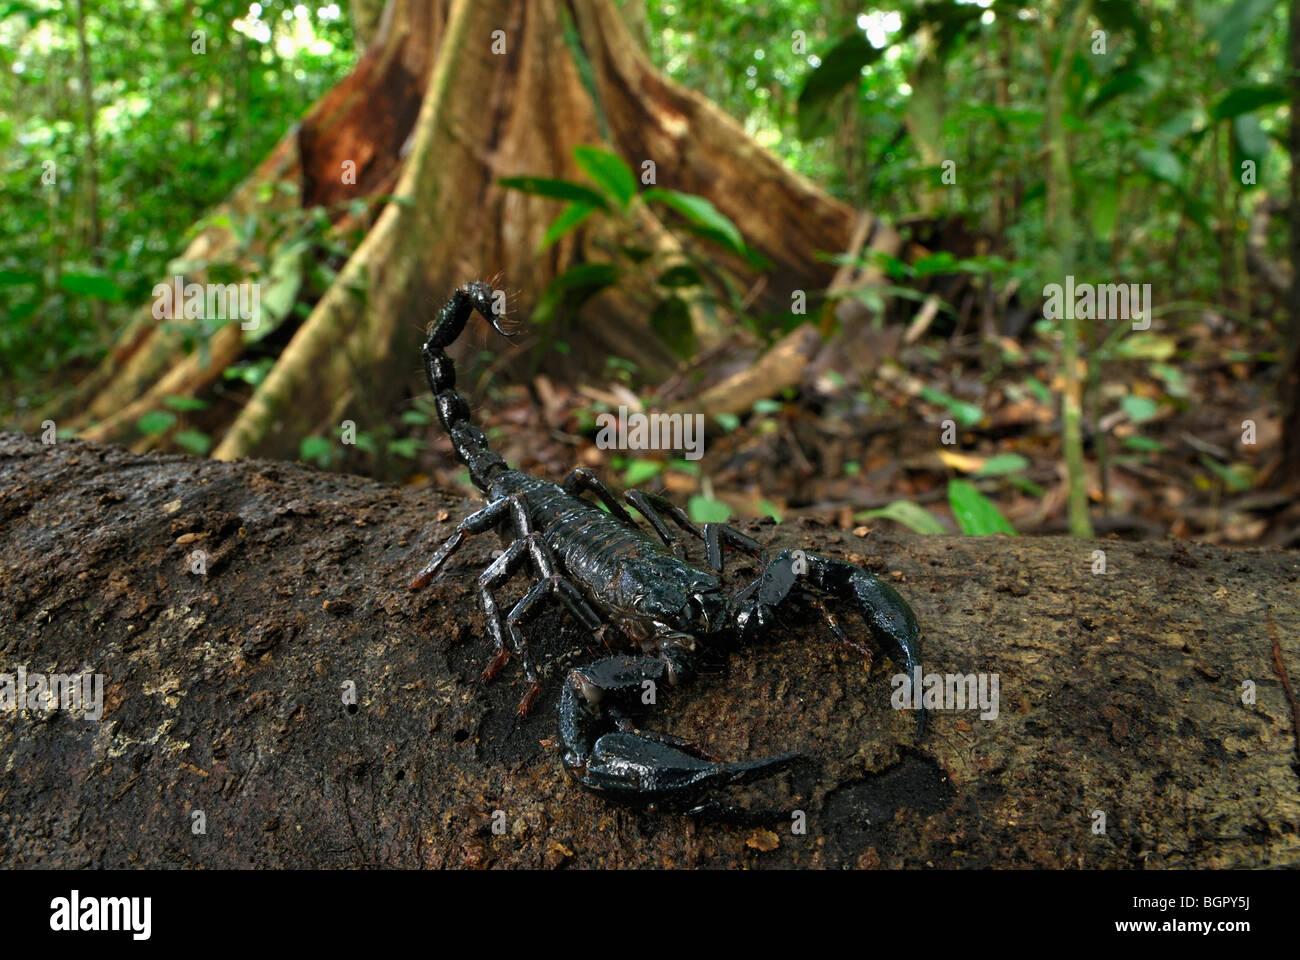 Scorpion (Heterometrus longimanus borneensis), adult, Danum Valley Conservation Area, Sabah, Borneo, Malaysia - Stock Image